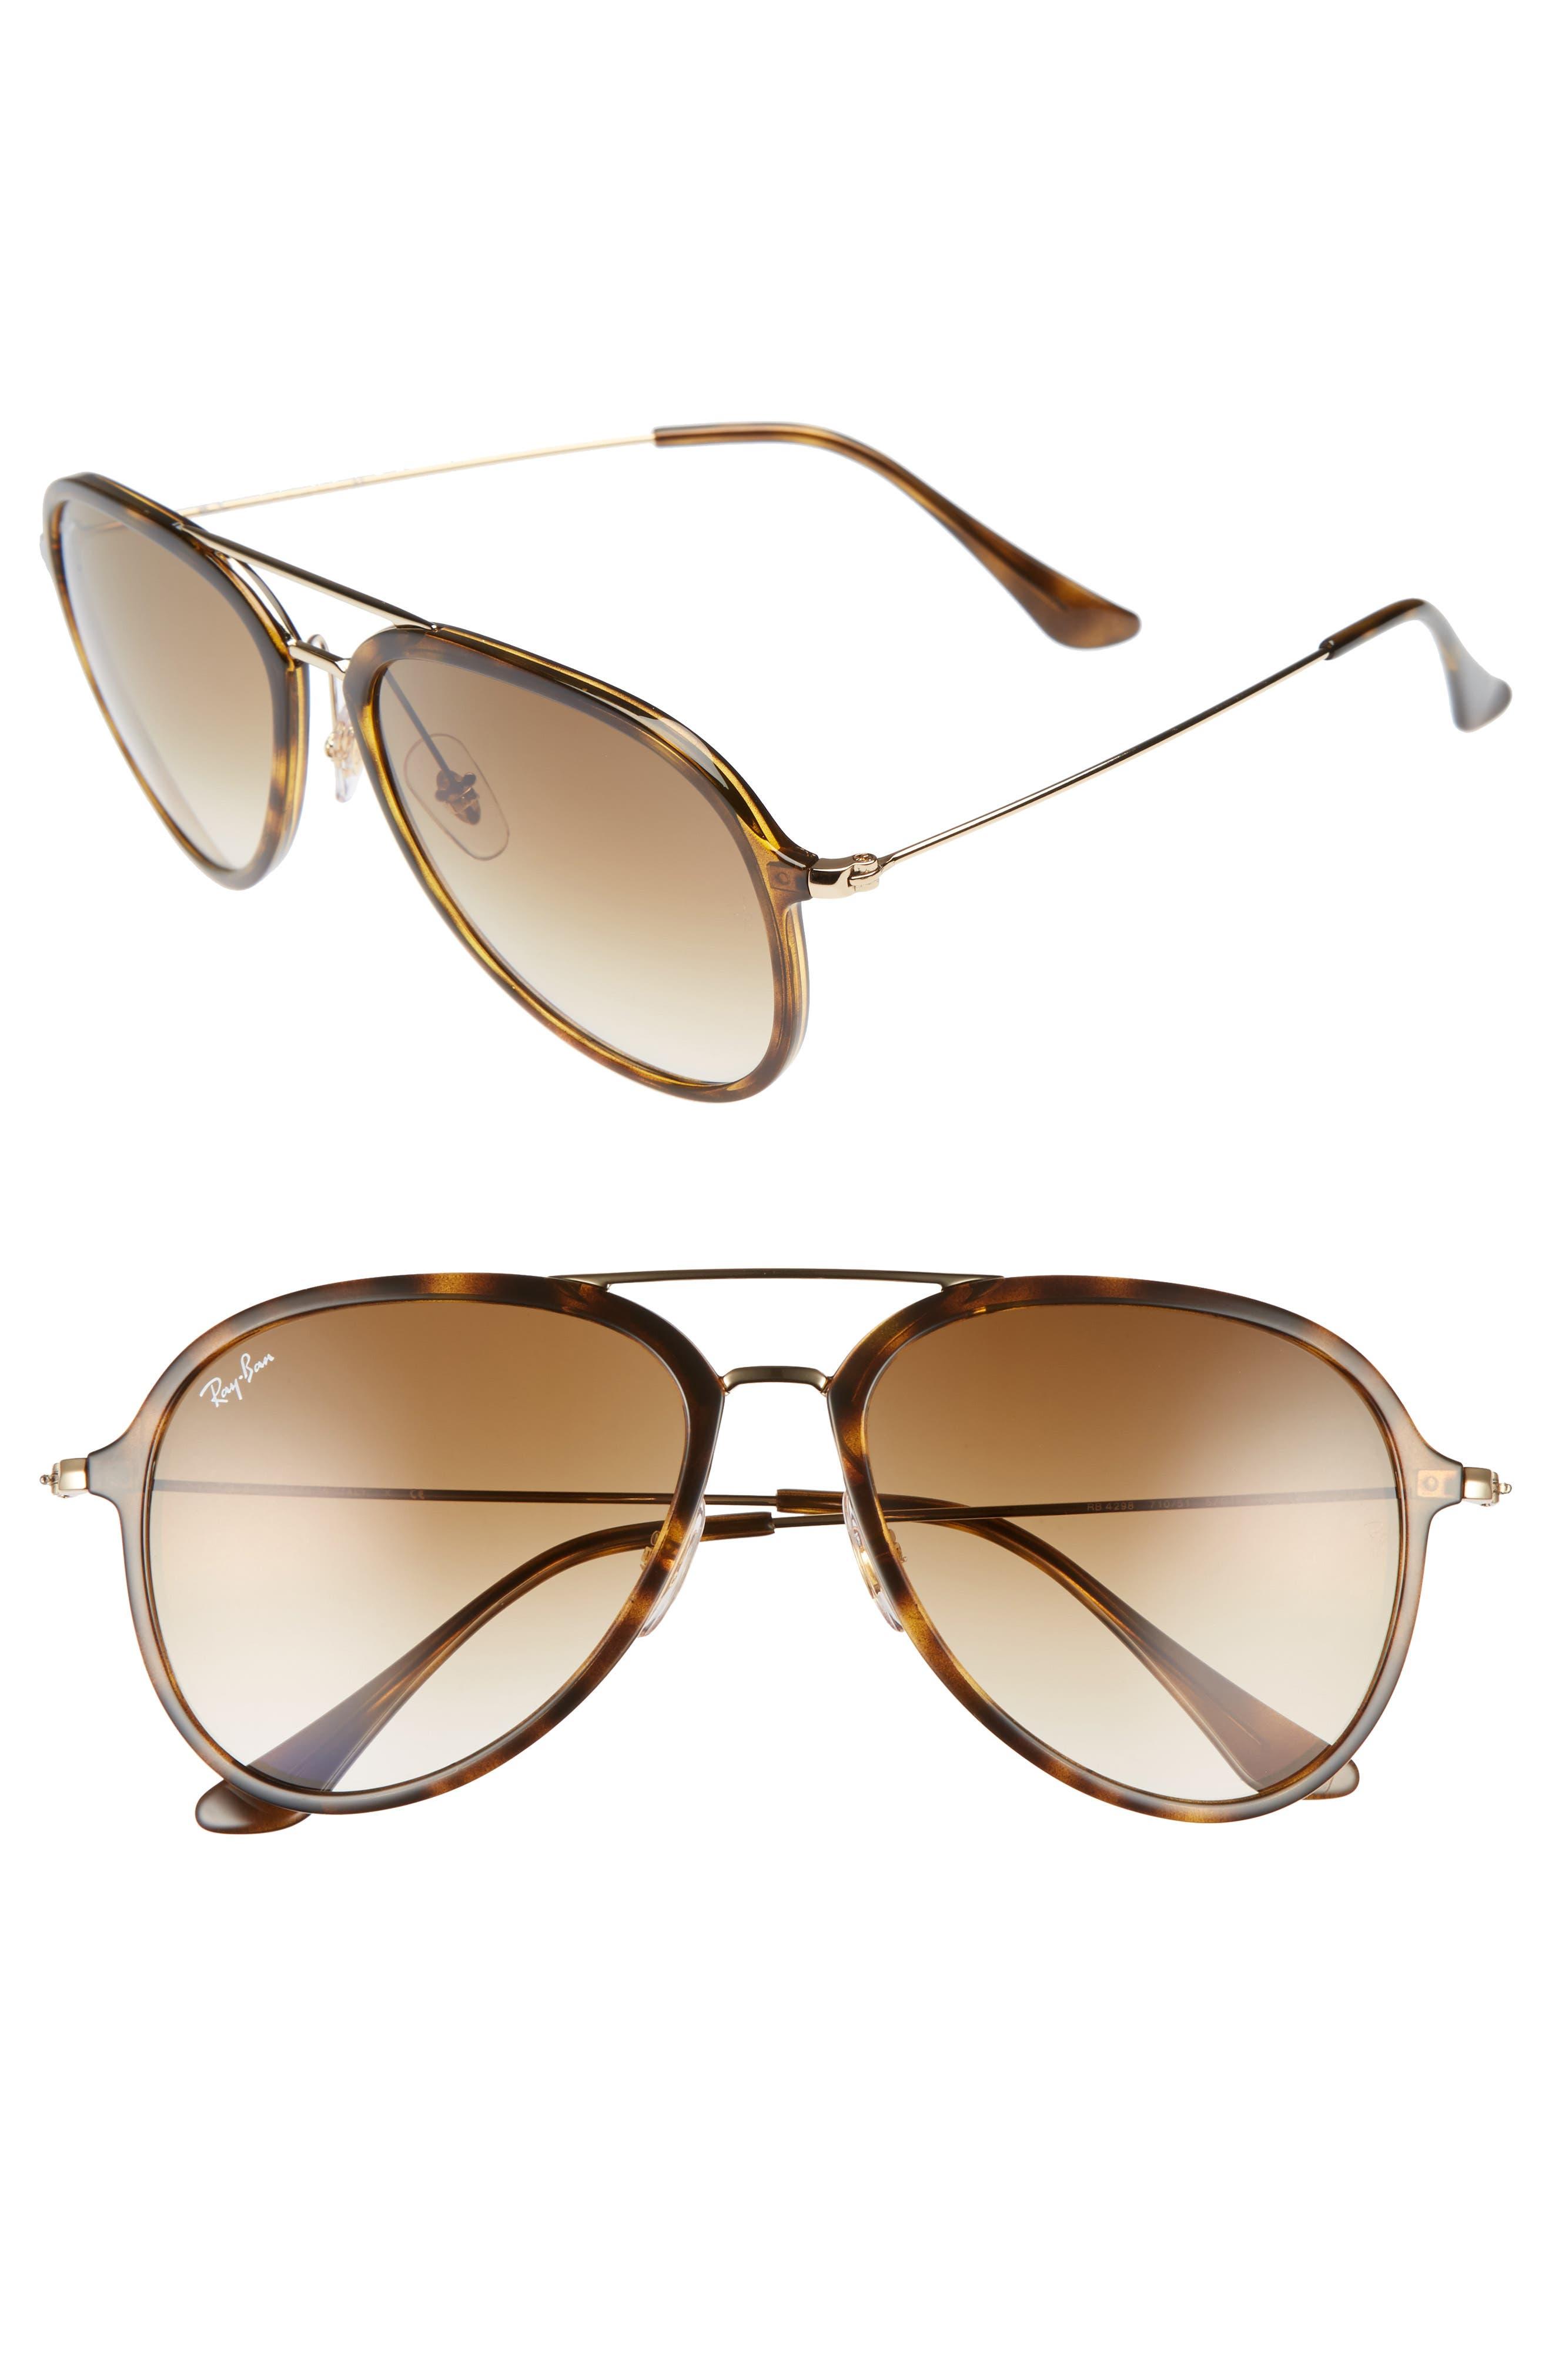 57mm Pilot Sunglasses,                             Main thumbnail 1, color,                             LIGHT HAVANA